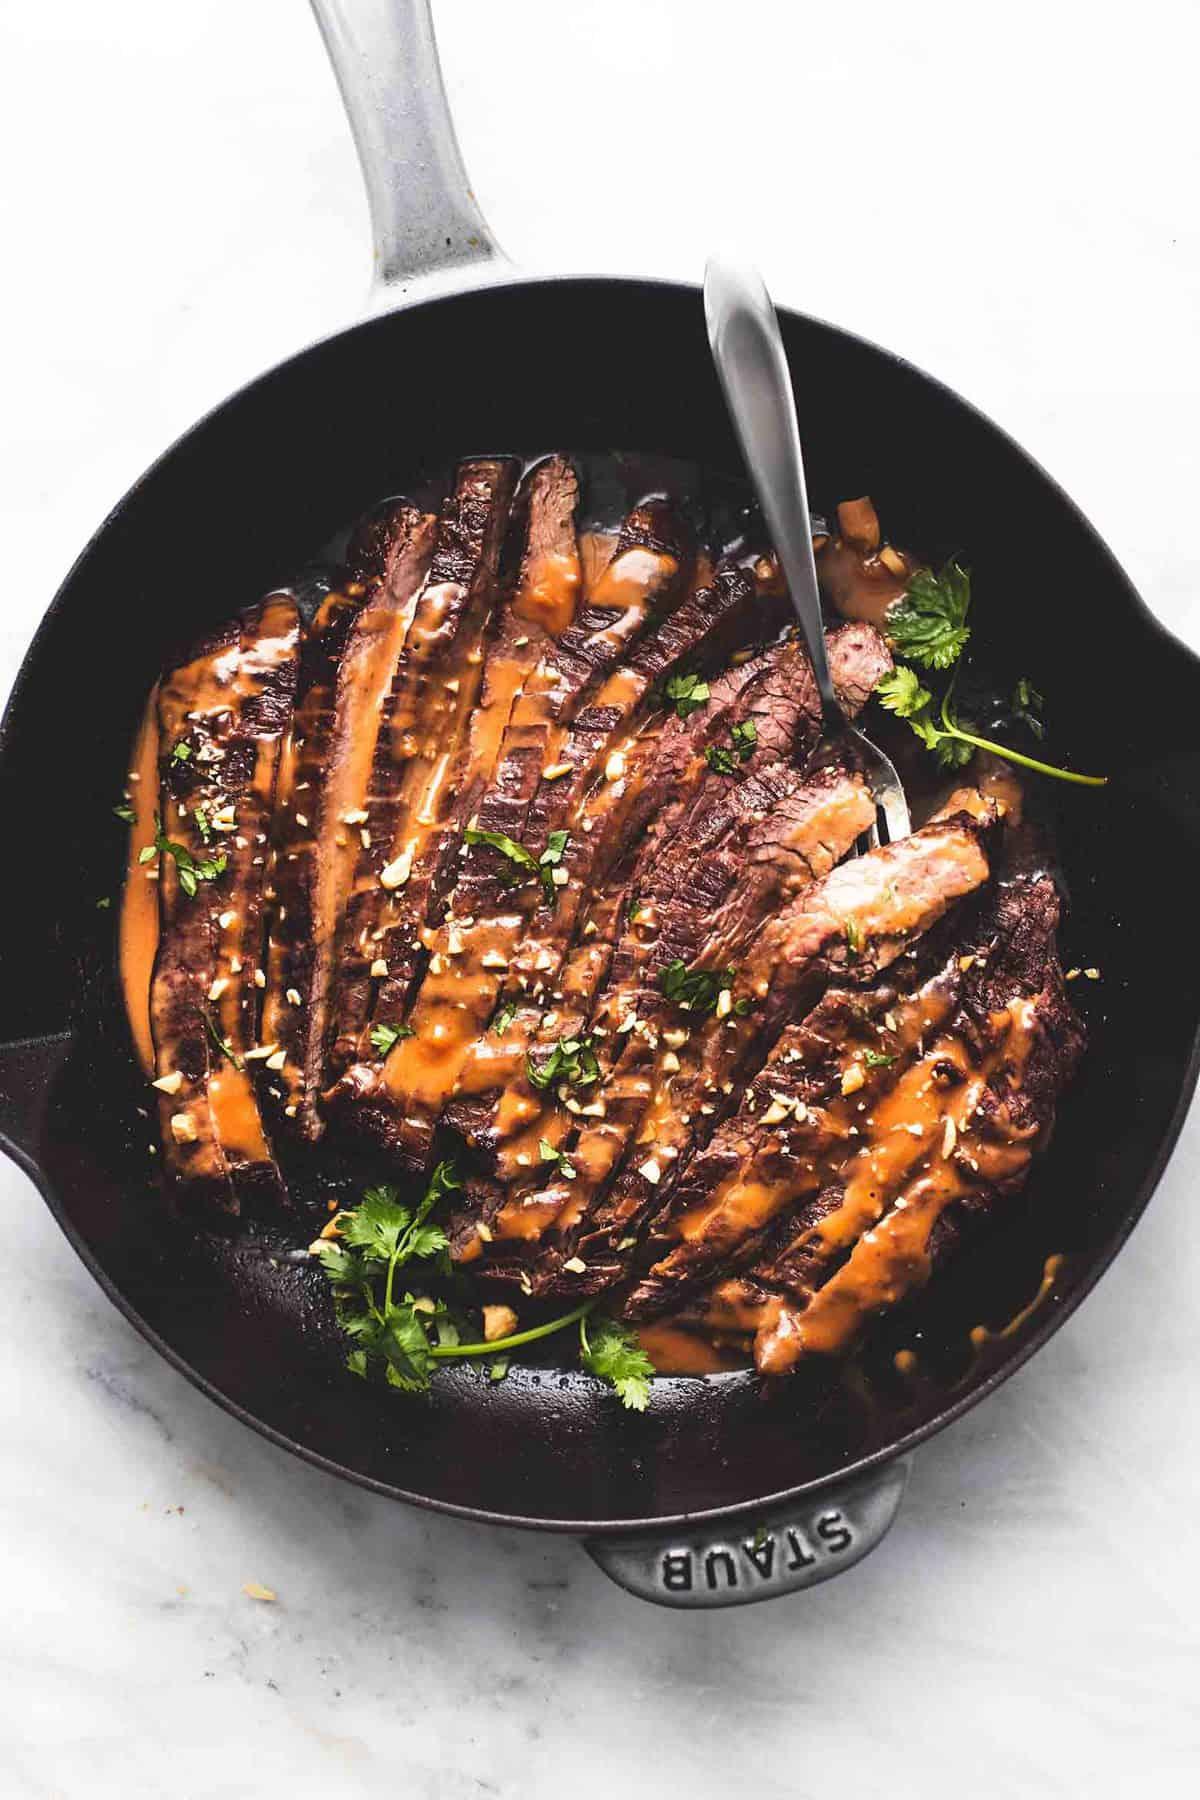 Thai Peanut Beef (Five Ingredients) easy dinner recipe | lecremedelacrumb.com